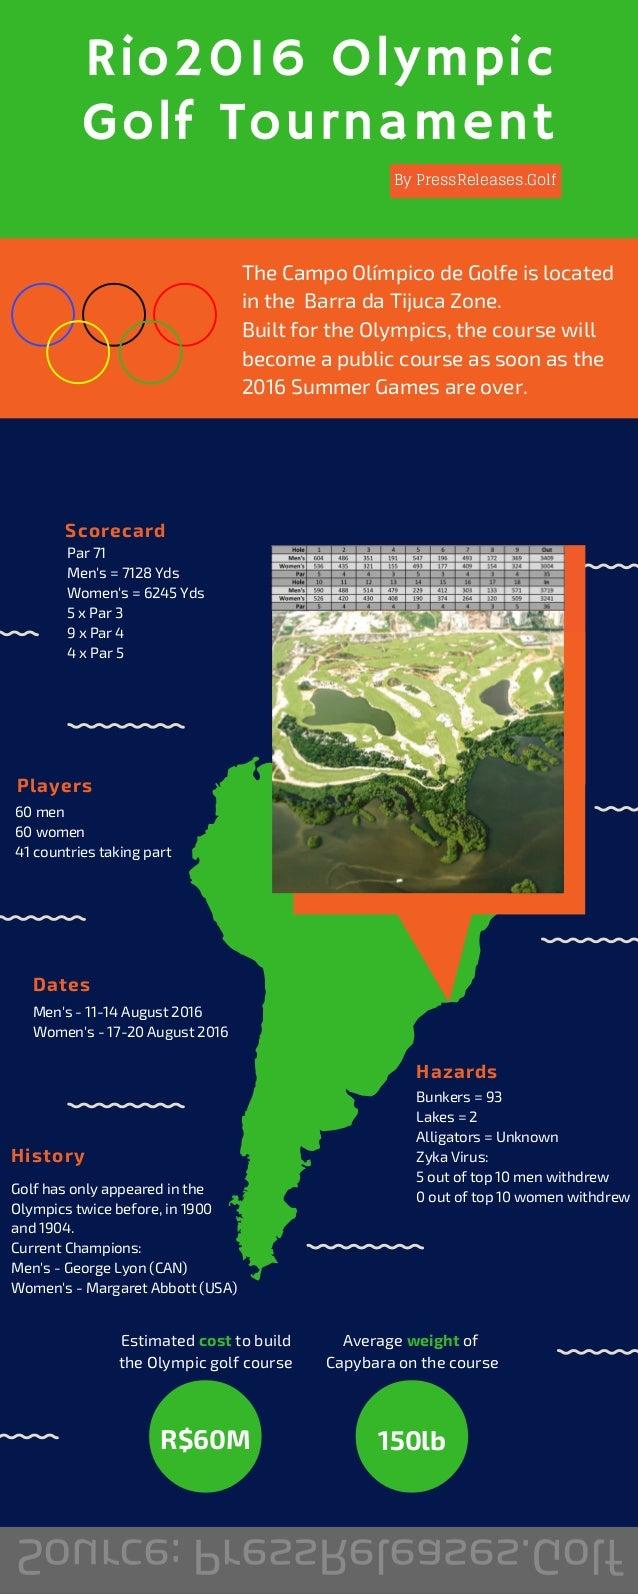 Rio2016 Olympic Golf Tournament Scorecard Hazards Players History Par 71 Men's = 7128 Yds Women's = 6245 Yds 5 x Par 3 9 x...